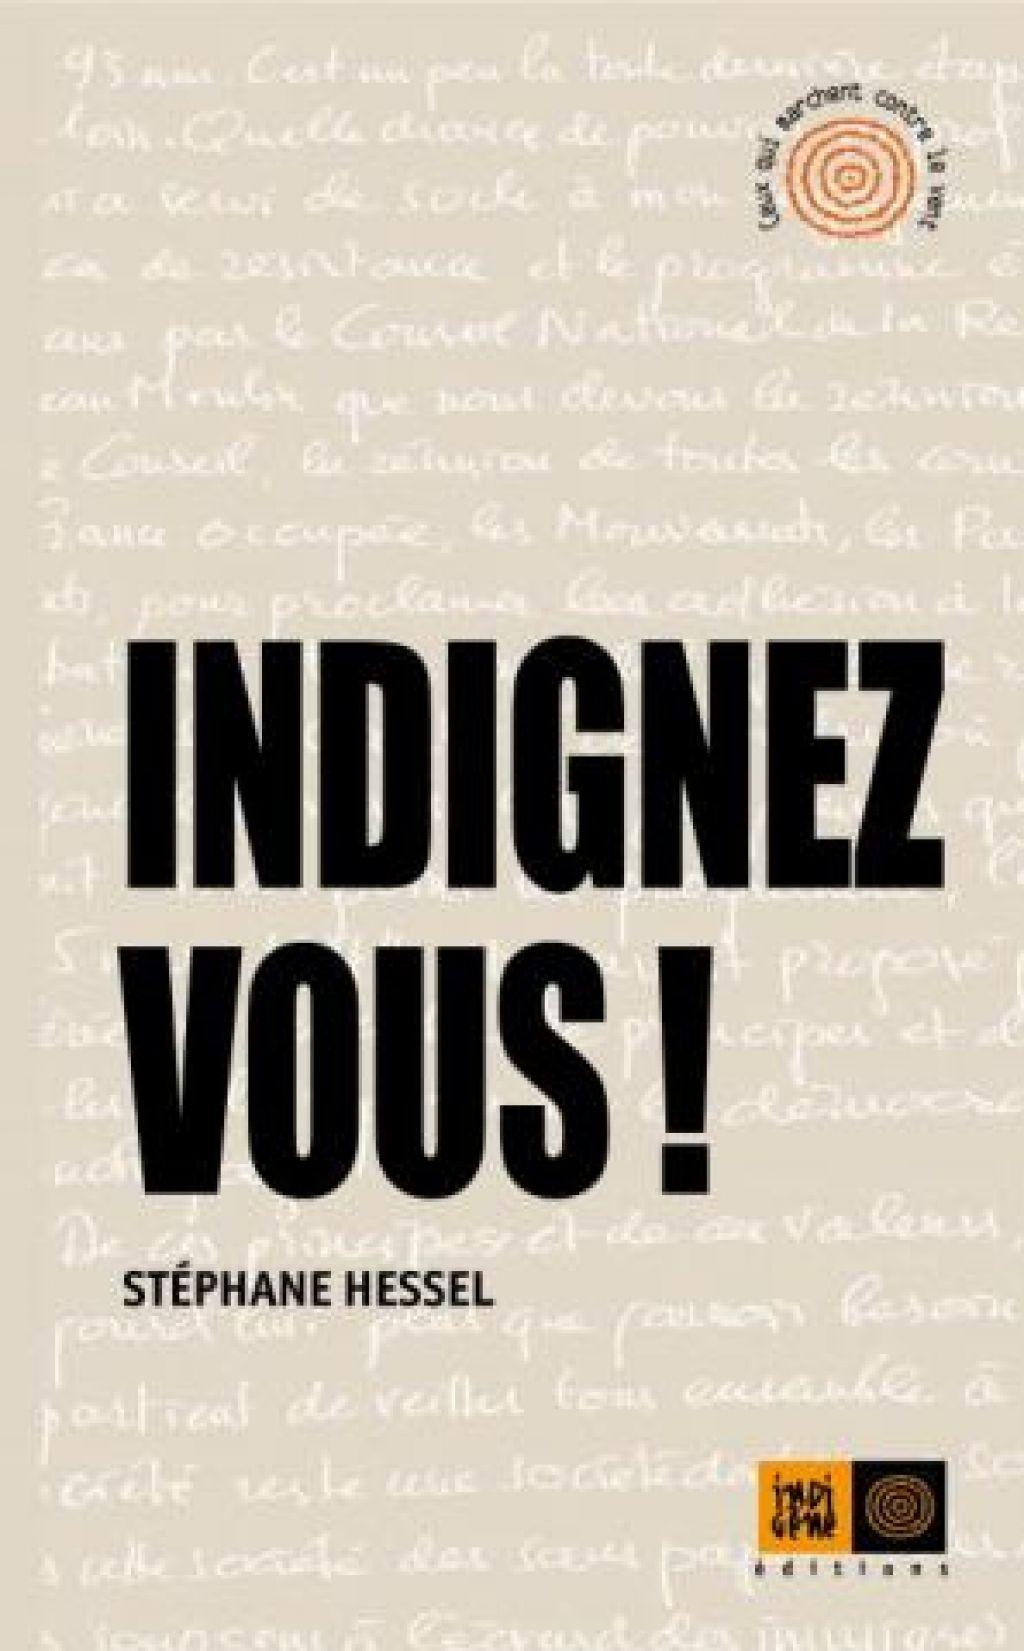 Odmevna knjiga Stéphana Hessela: Dvignite se!